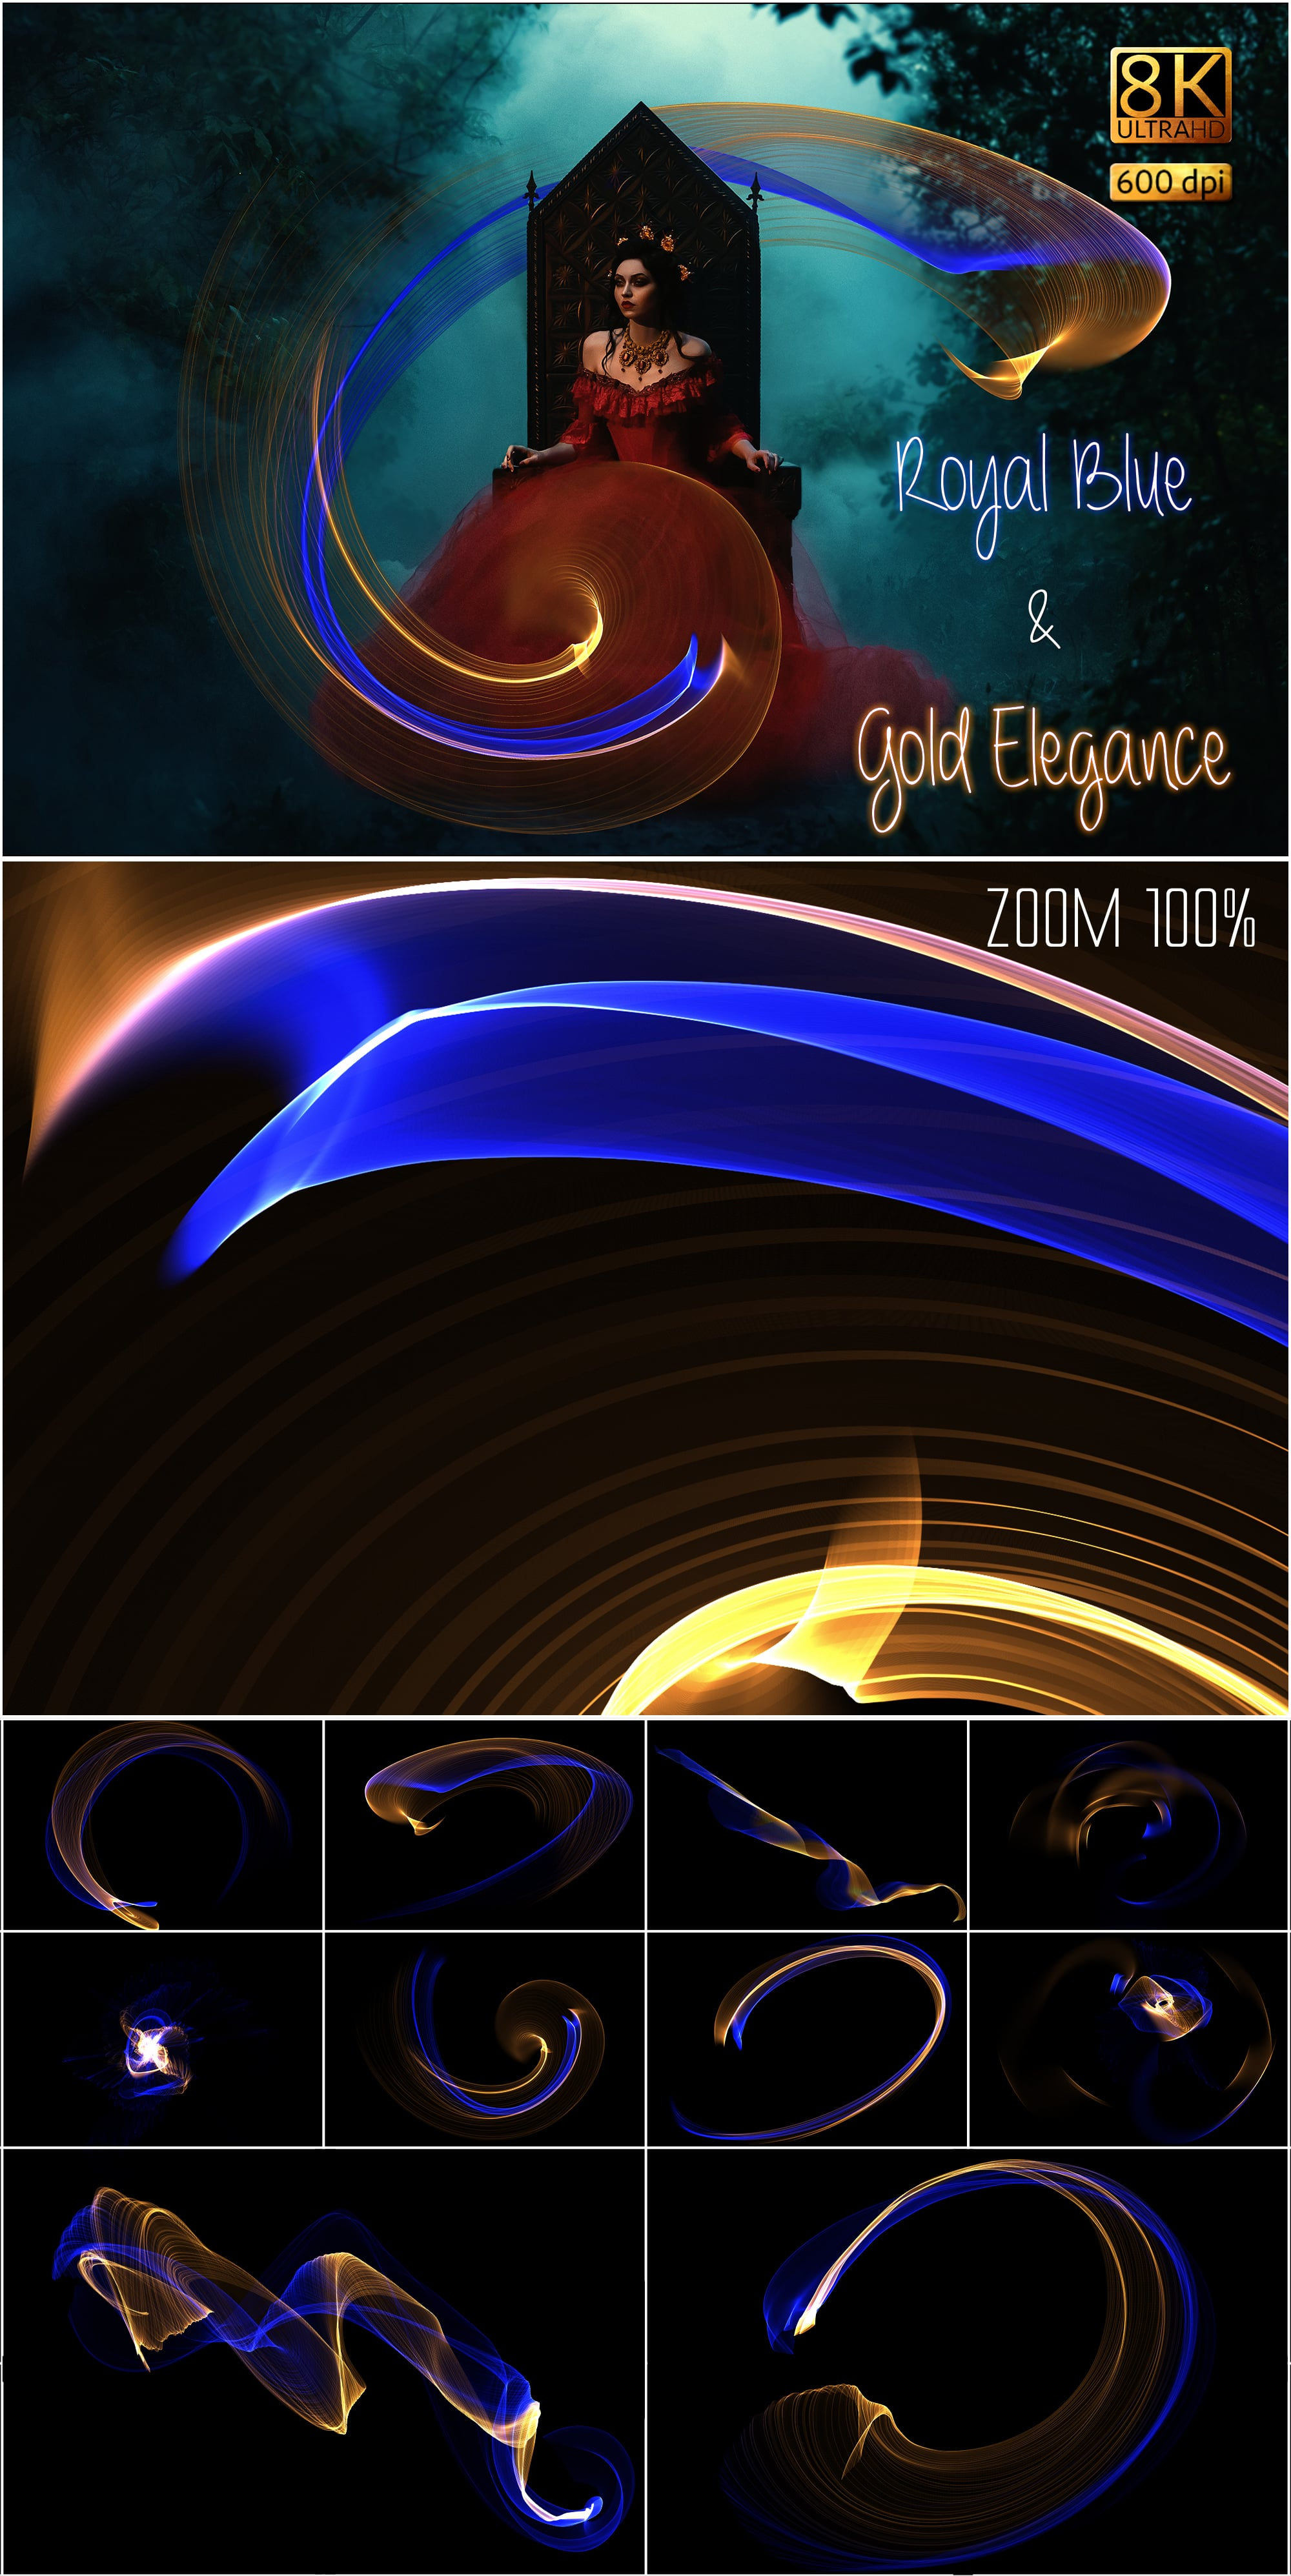 149 Professional Overlays - Royal Blue Gold Elegance